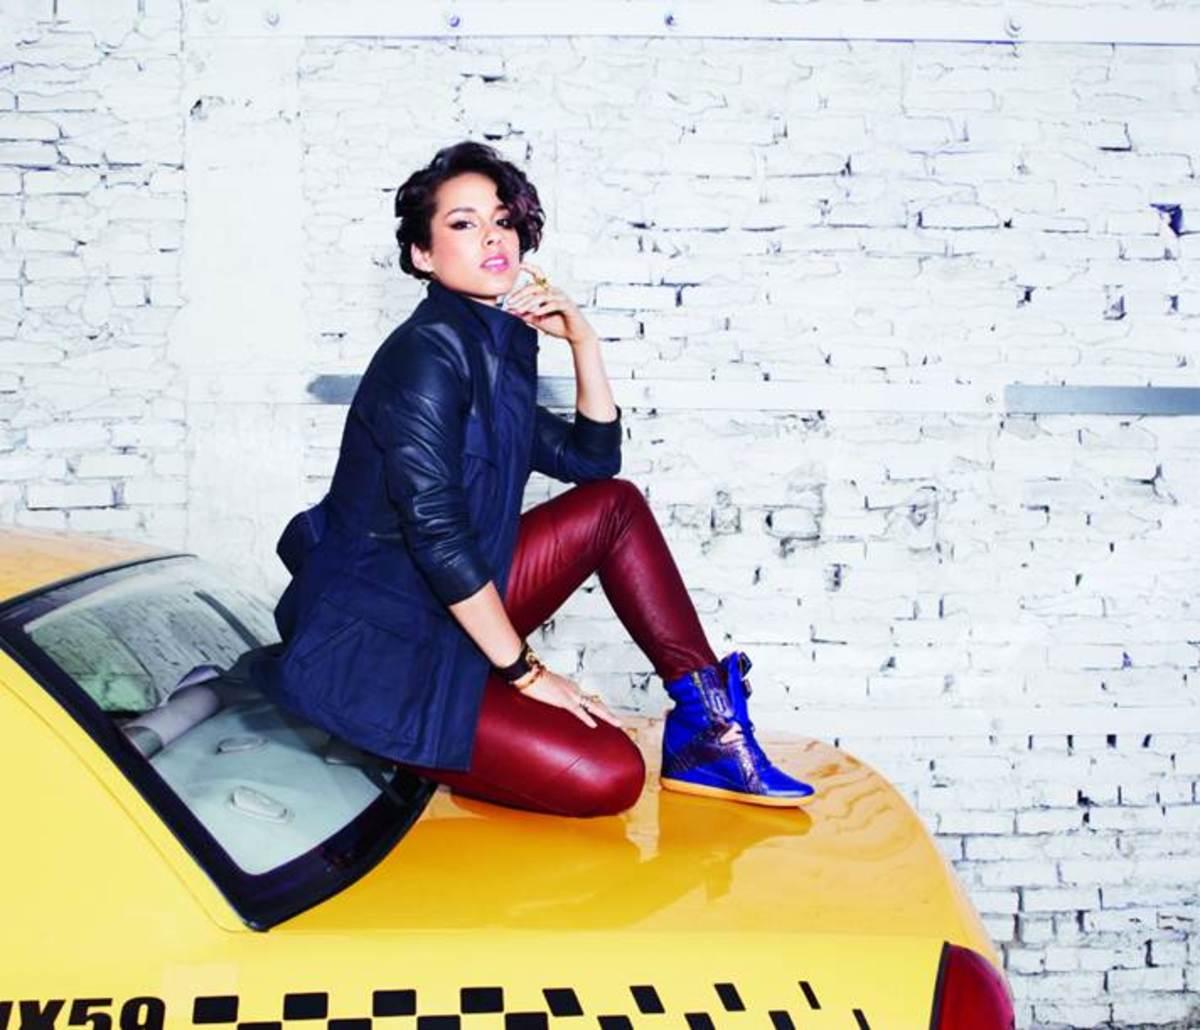 e036f1a9cca178 Fall 2013 Reebok Classic x Alicia Keys Collection - MomTrends